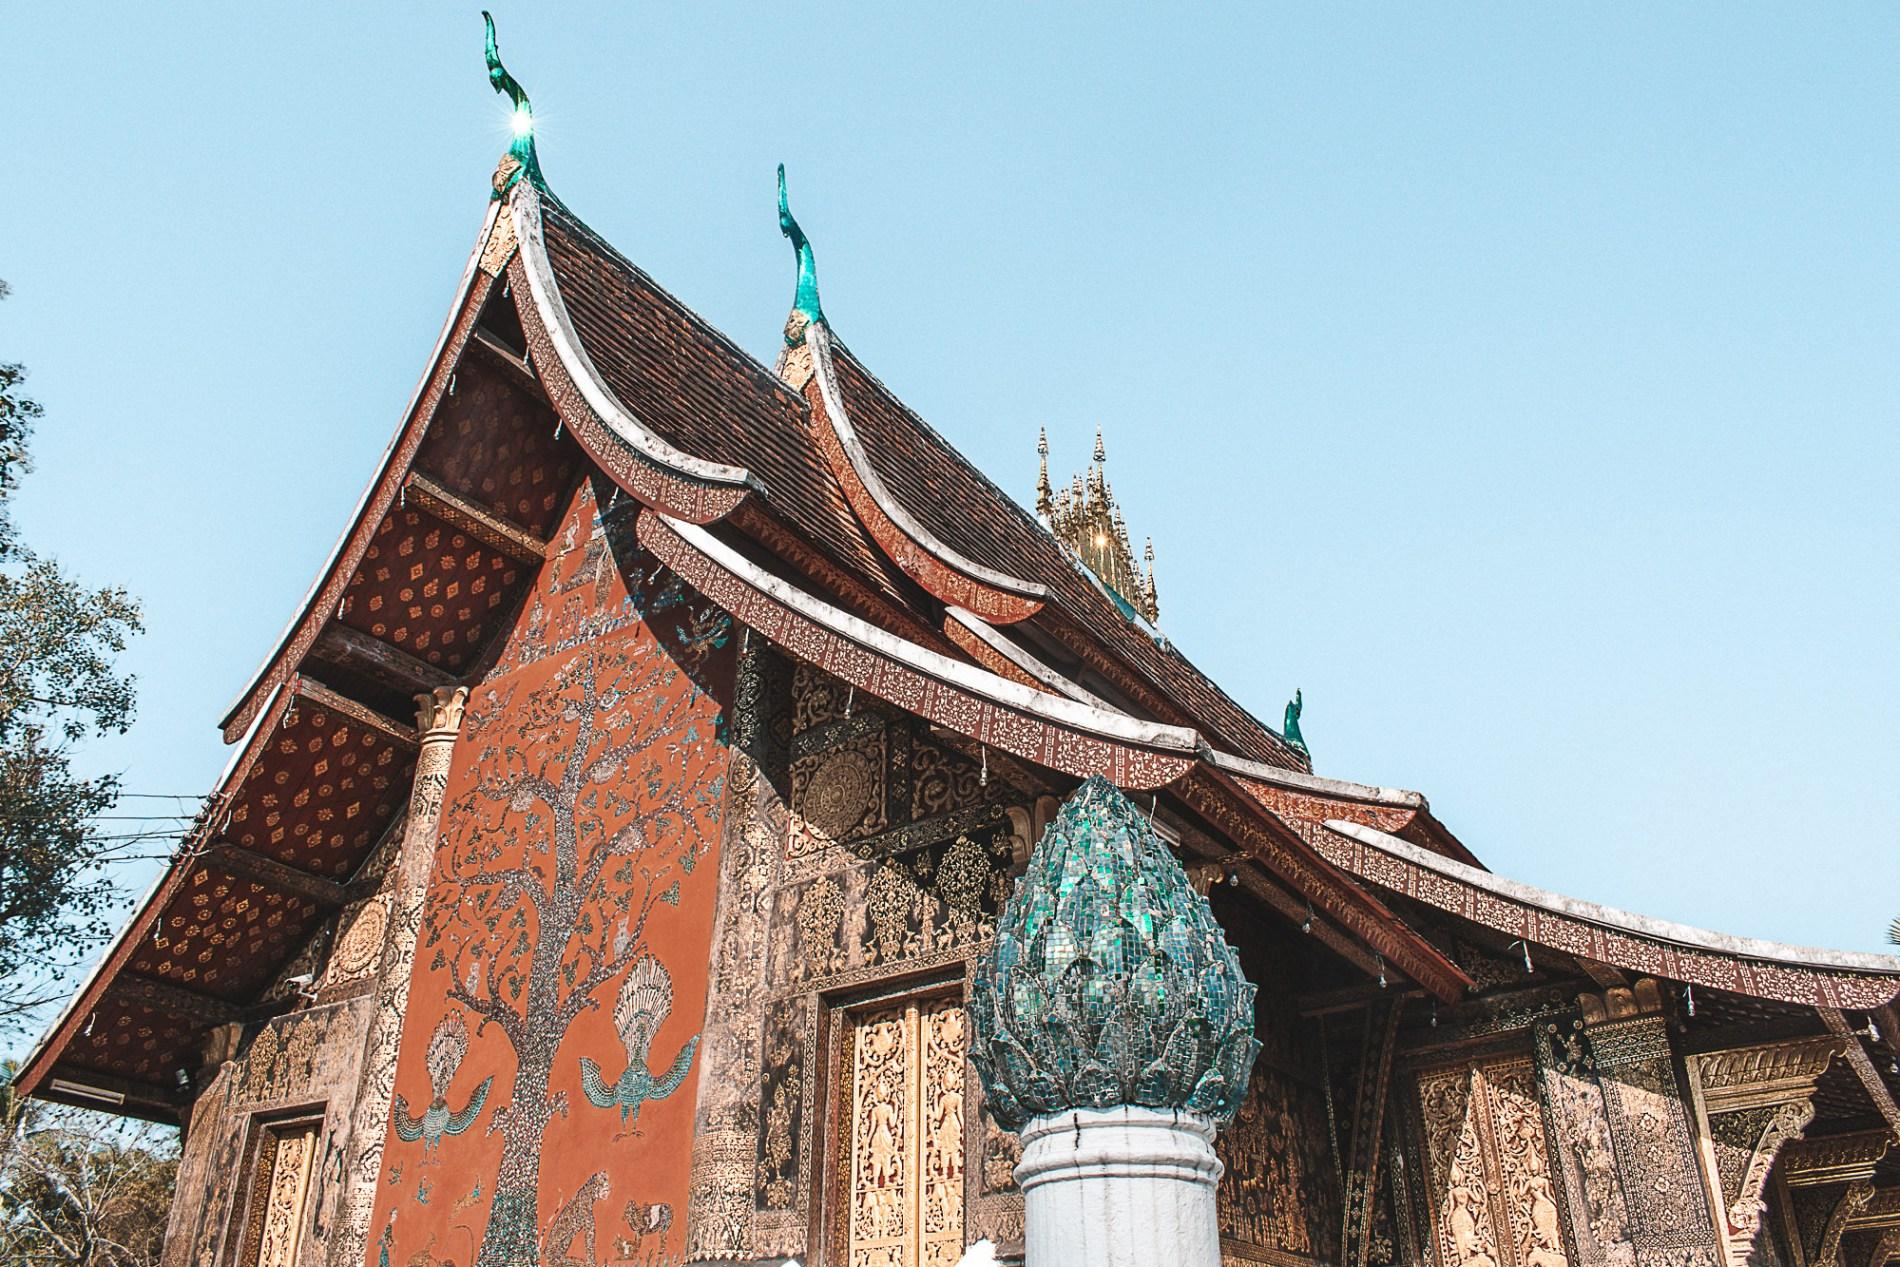 Templos em Luang Prabang